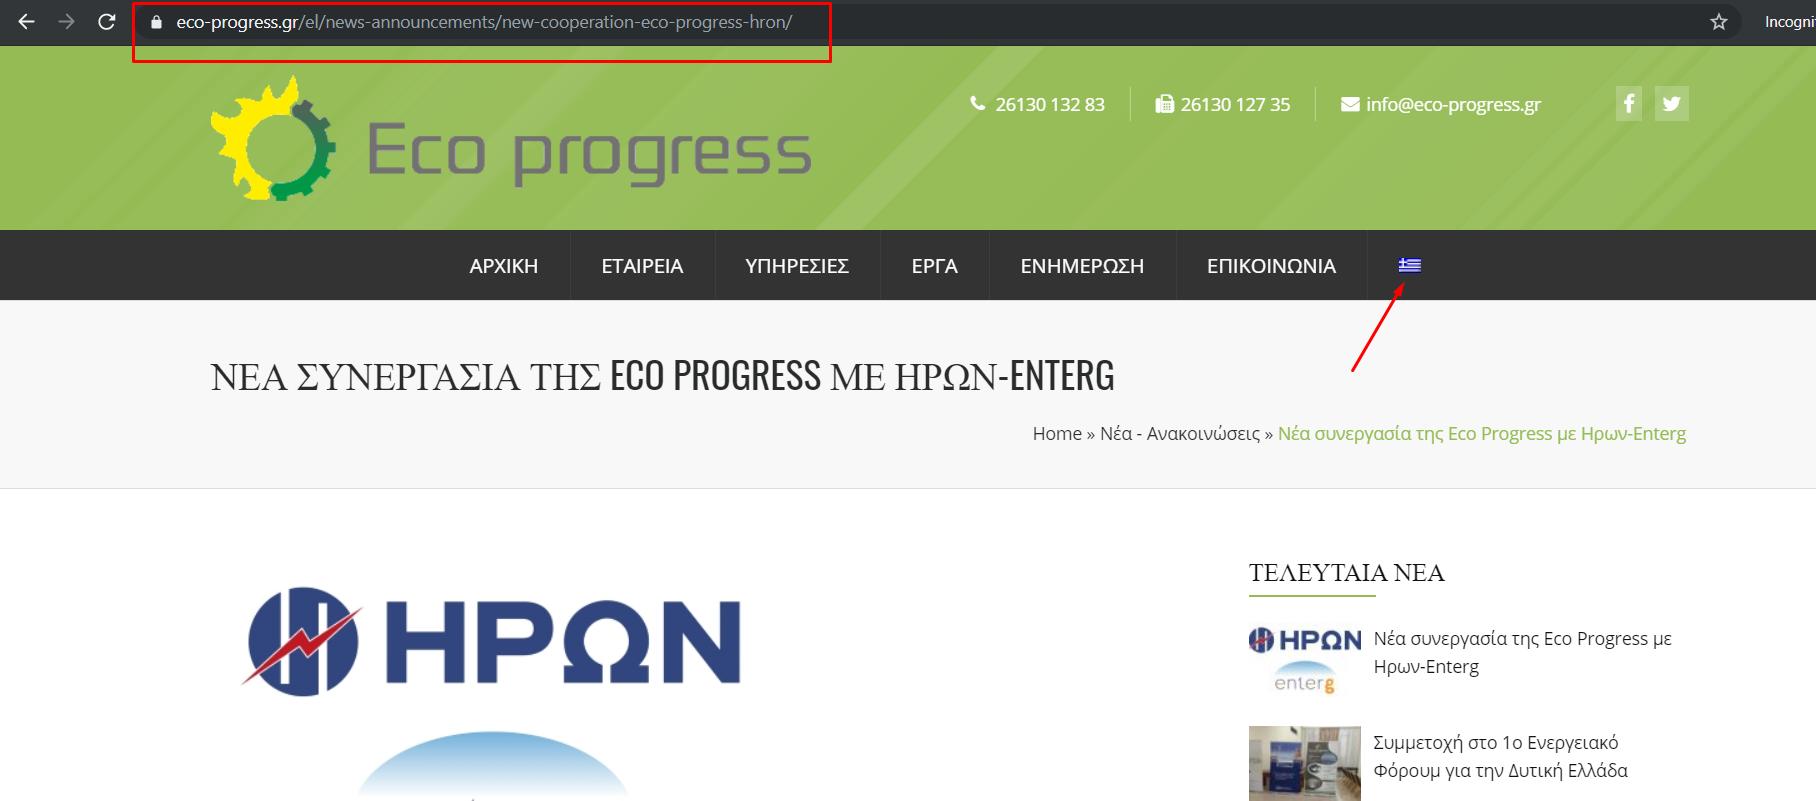 ecoprogr_page_Greek.png